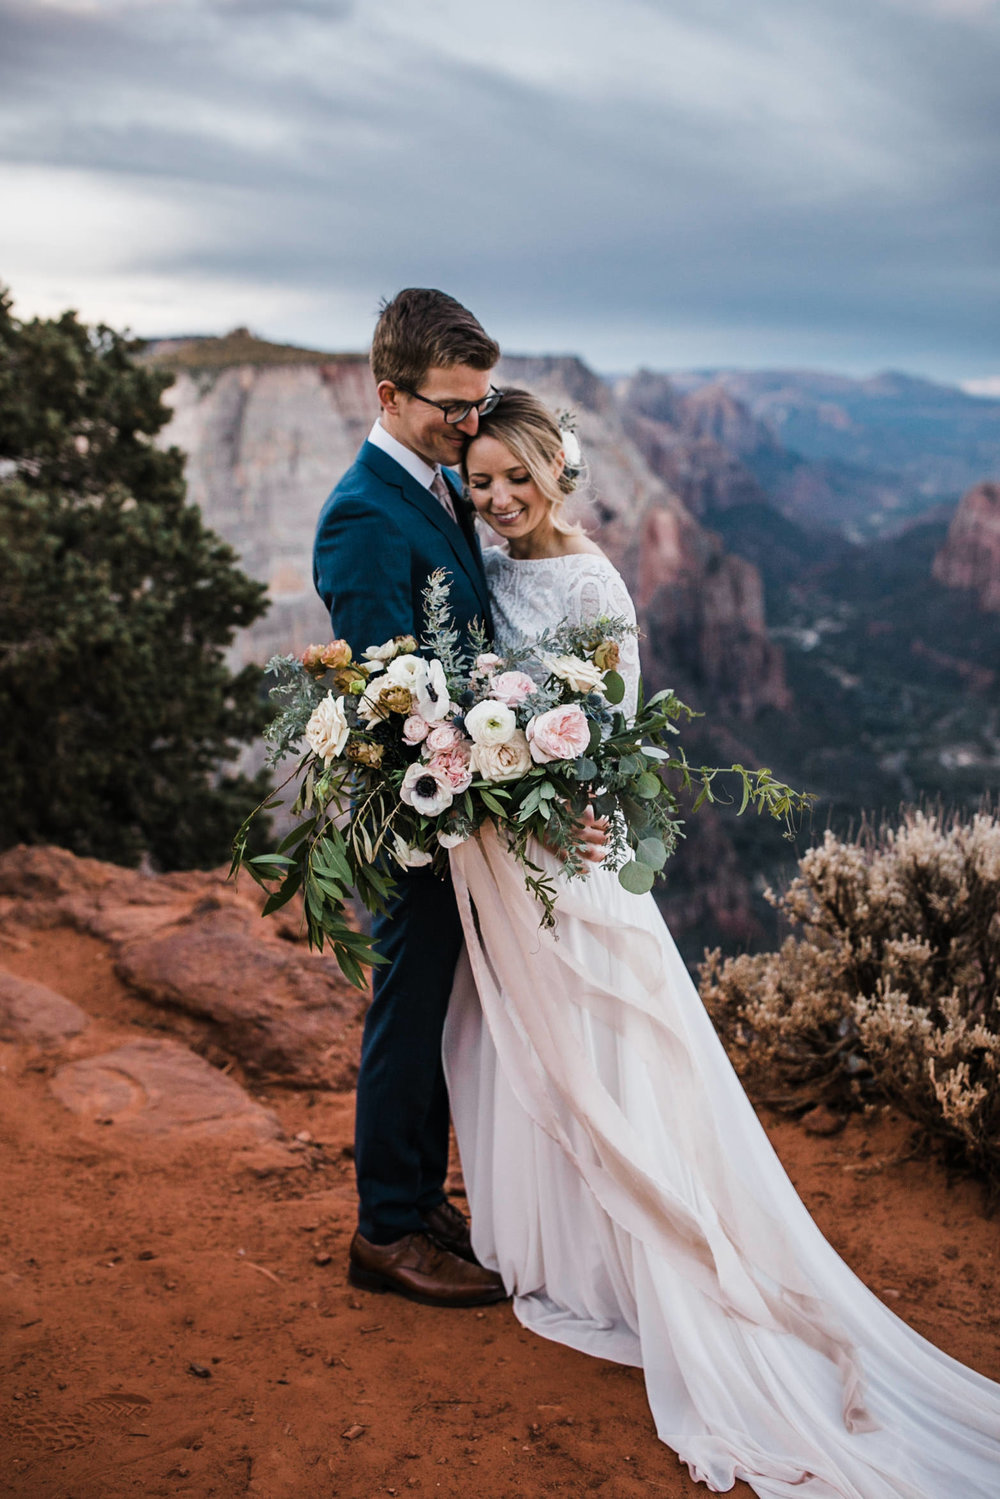 Zion-National-Park-Elopement-Wedding-Adventure-Hiking-Hearnes-Photography-19.jpg